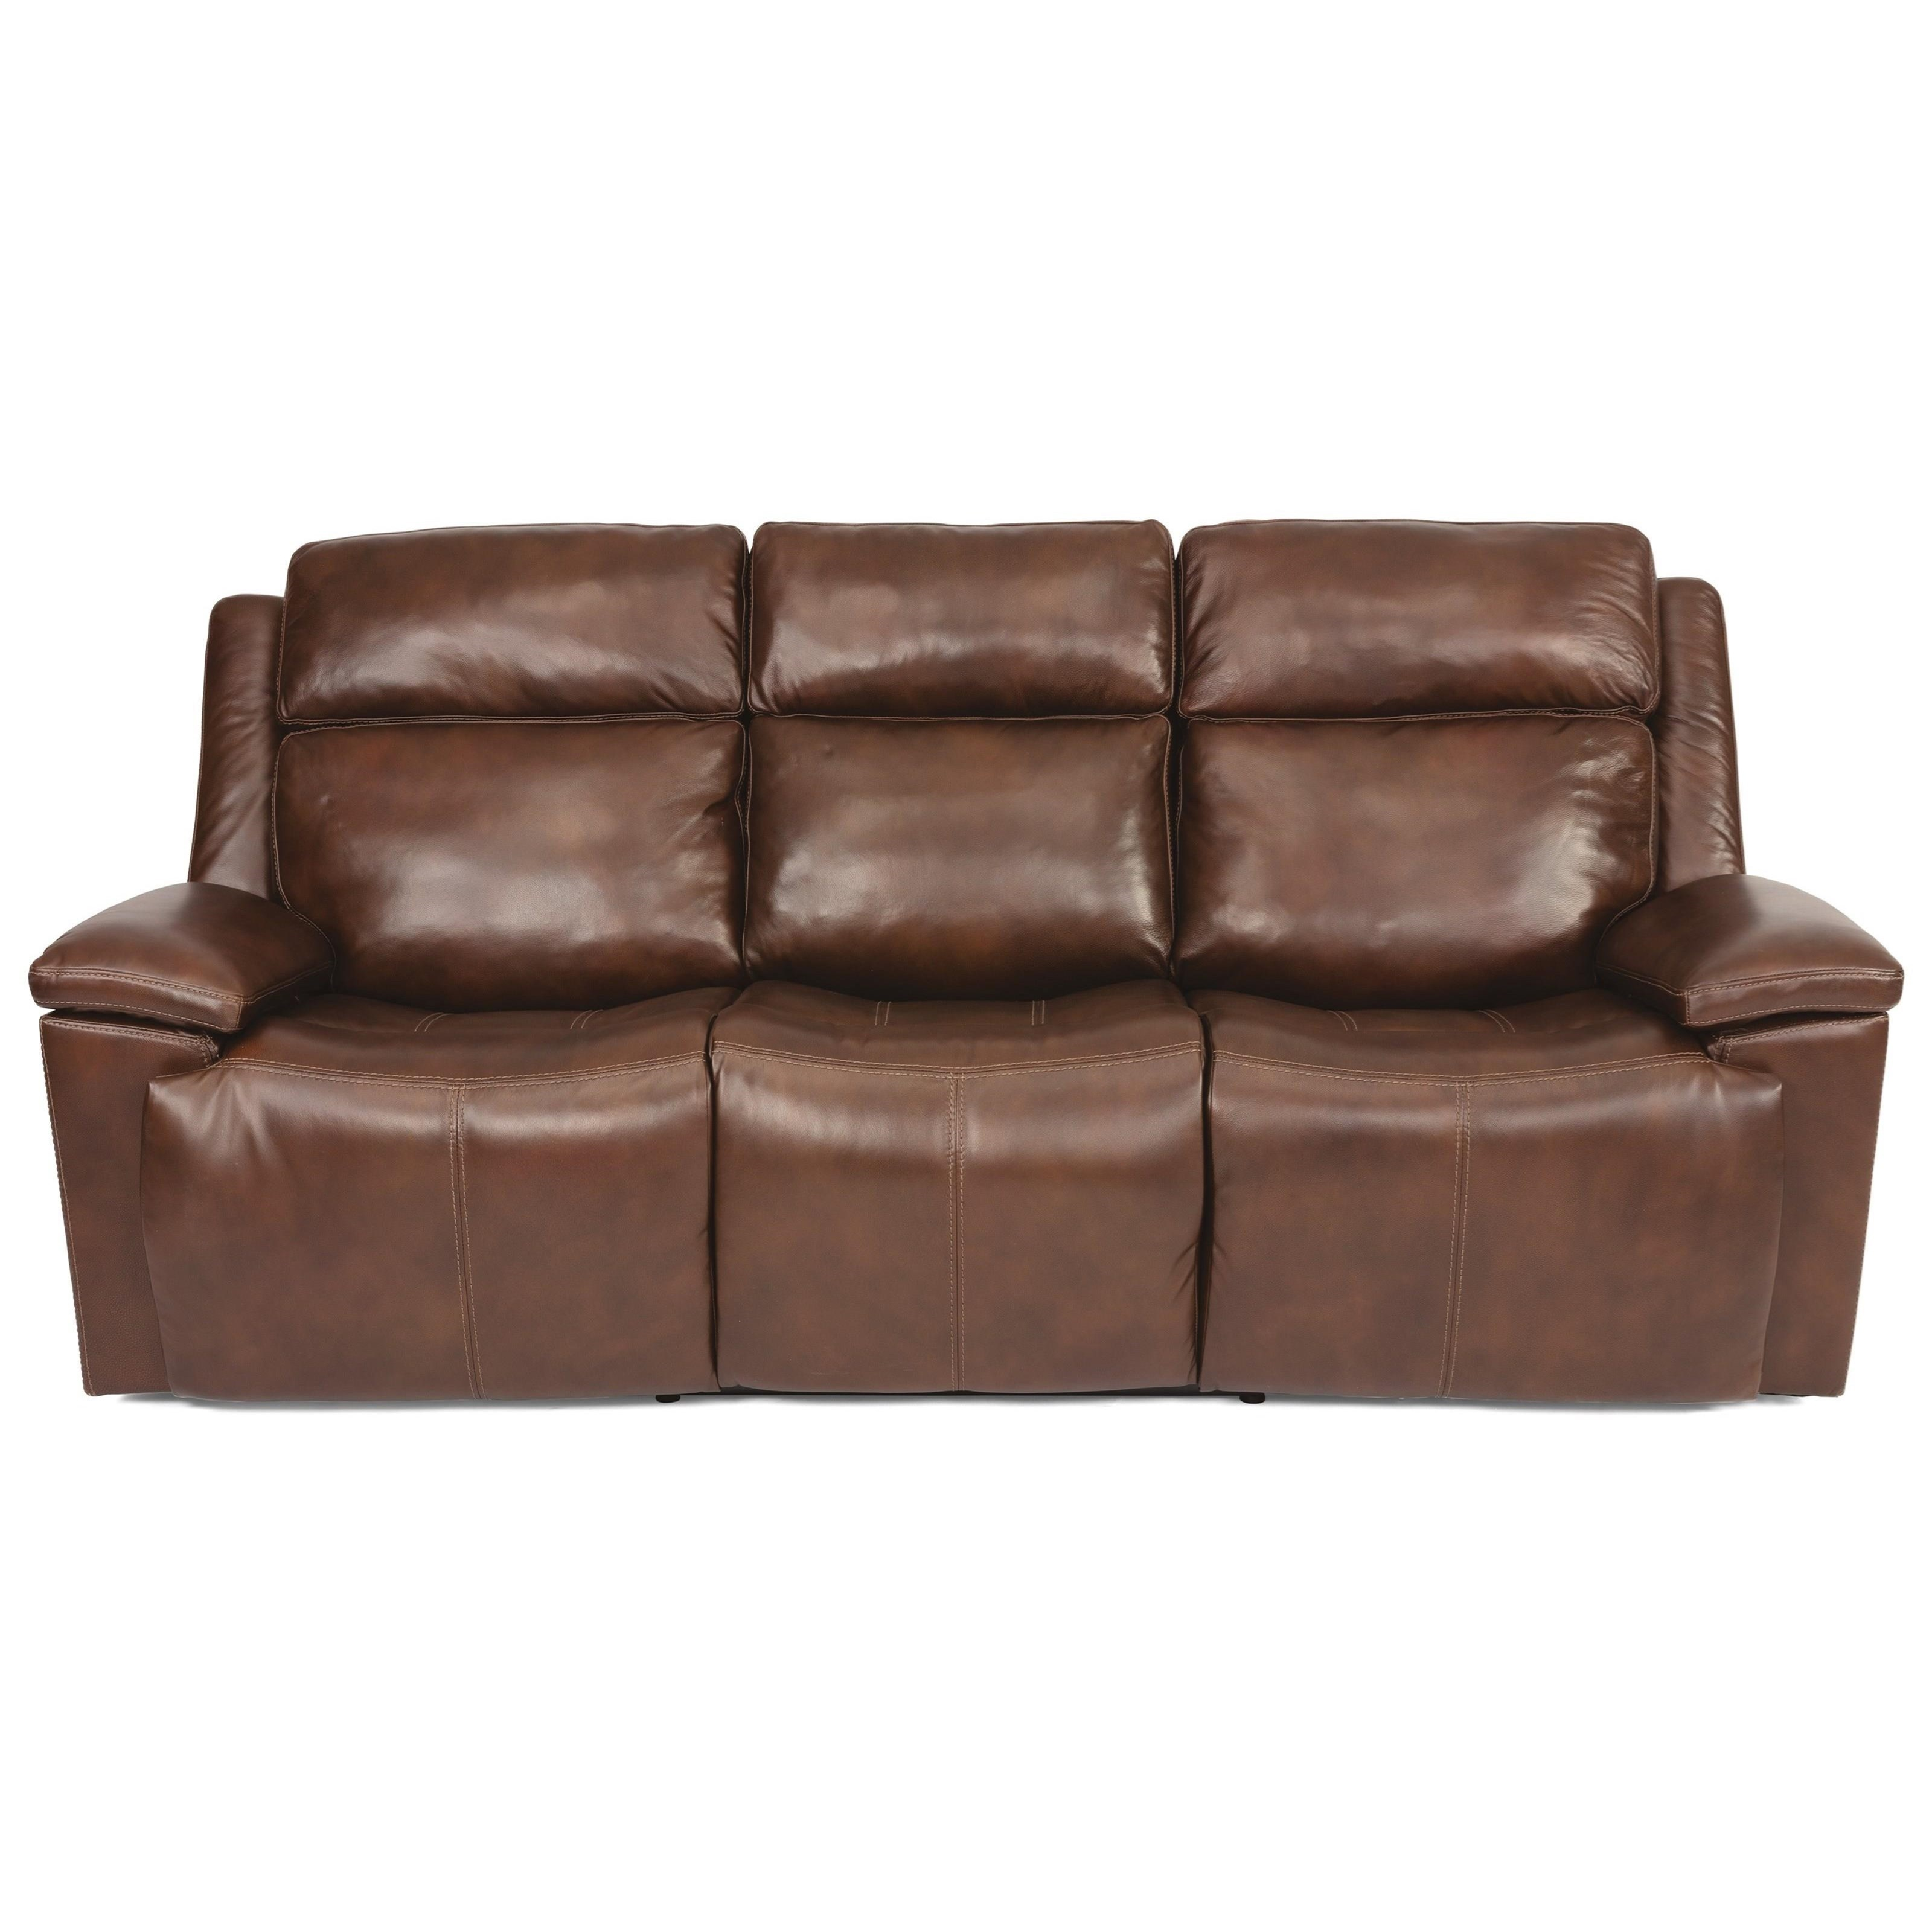 Latitudes - Chance Power Rcl Sofa w/ Pwr Headrest by Flexsteel at Walker's Furniture